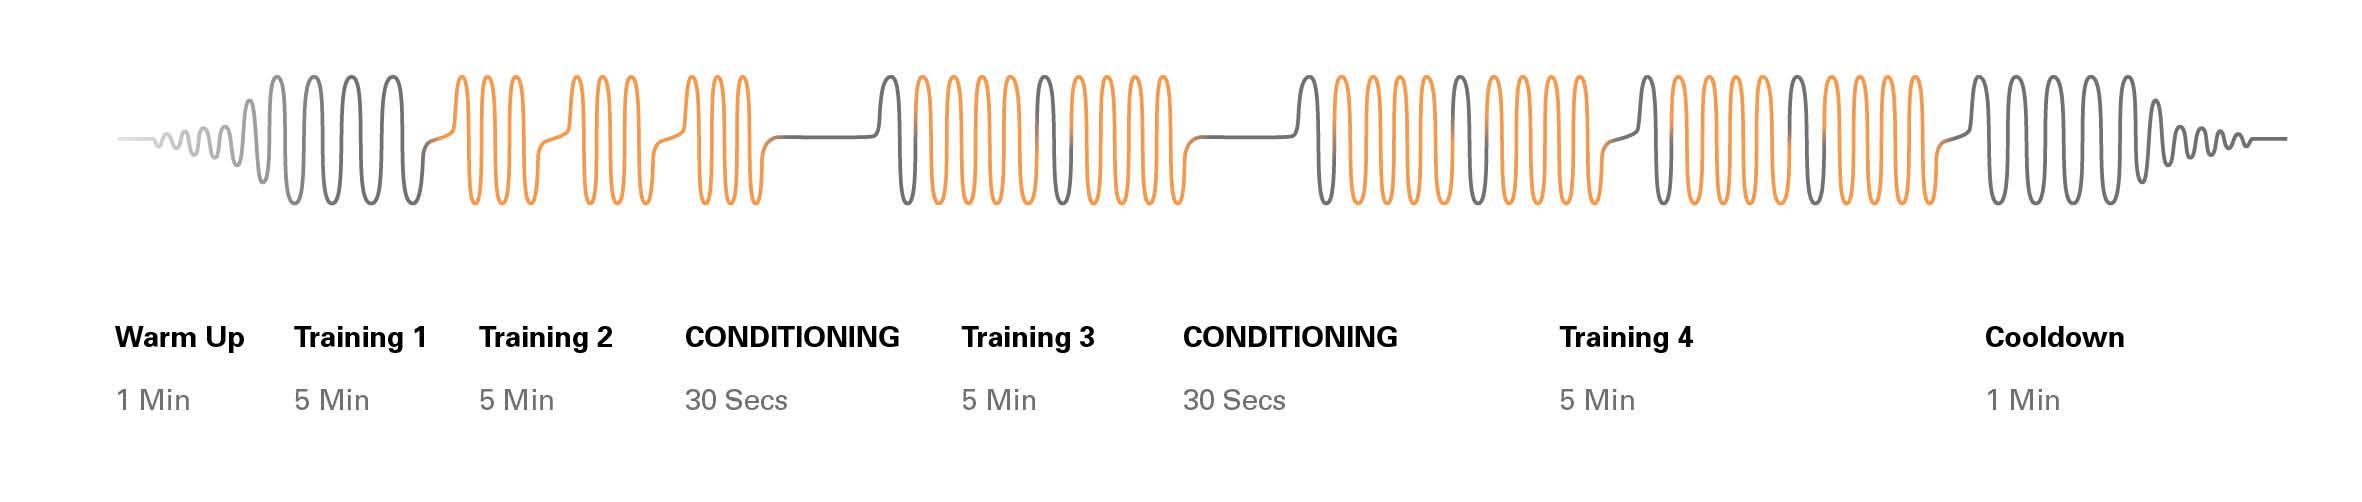 Sixpad 23 minutes training session